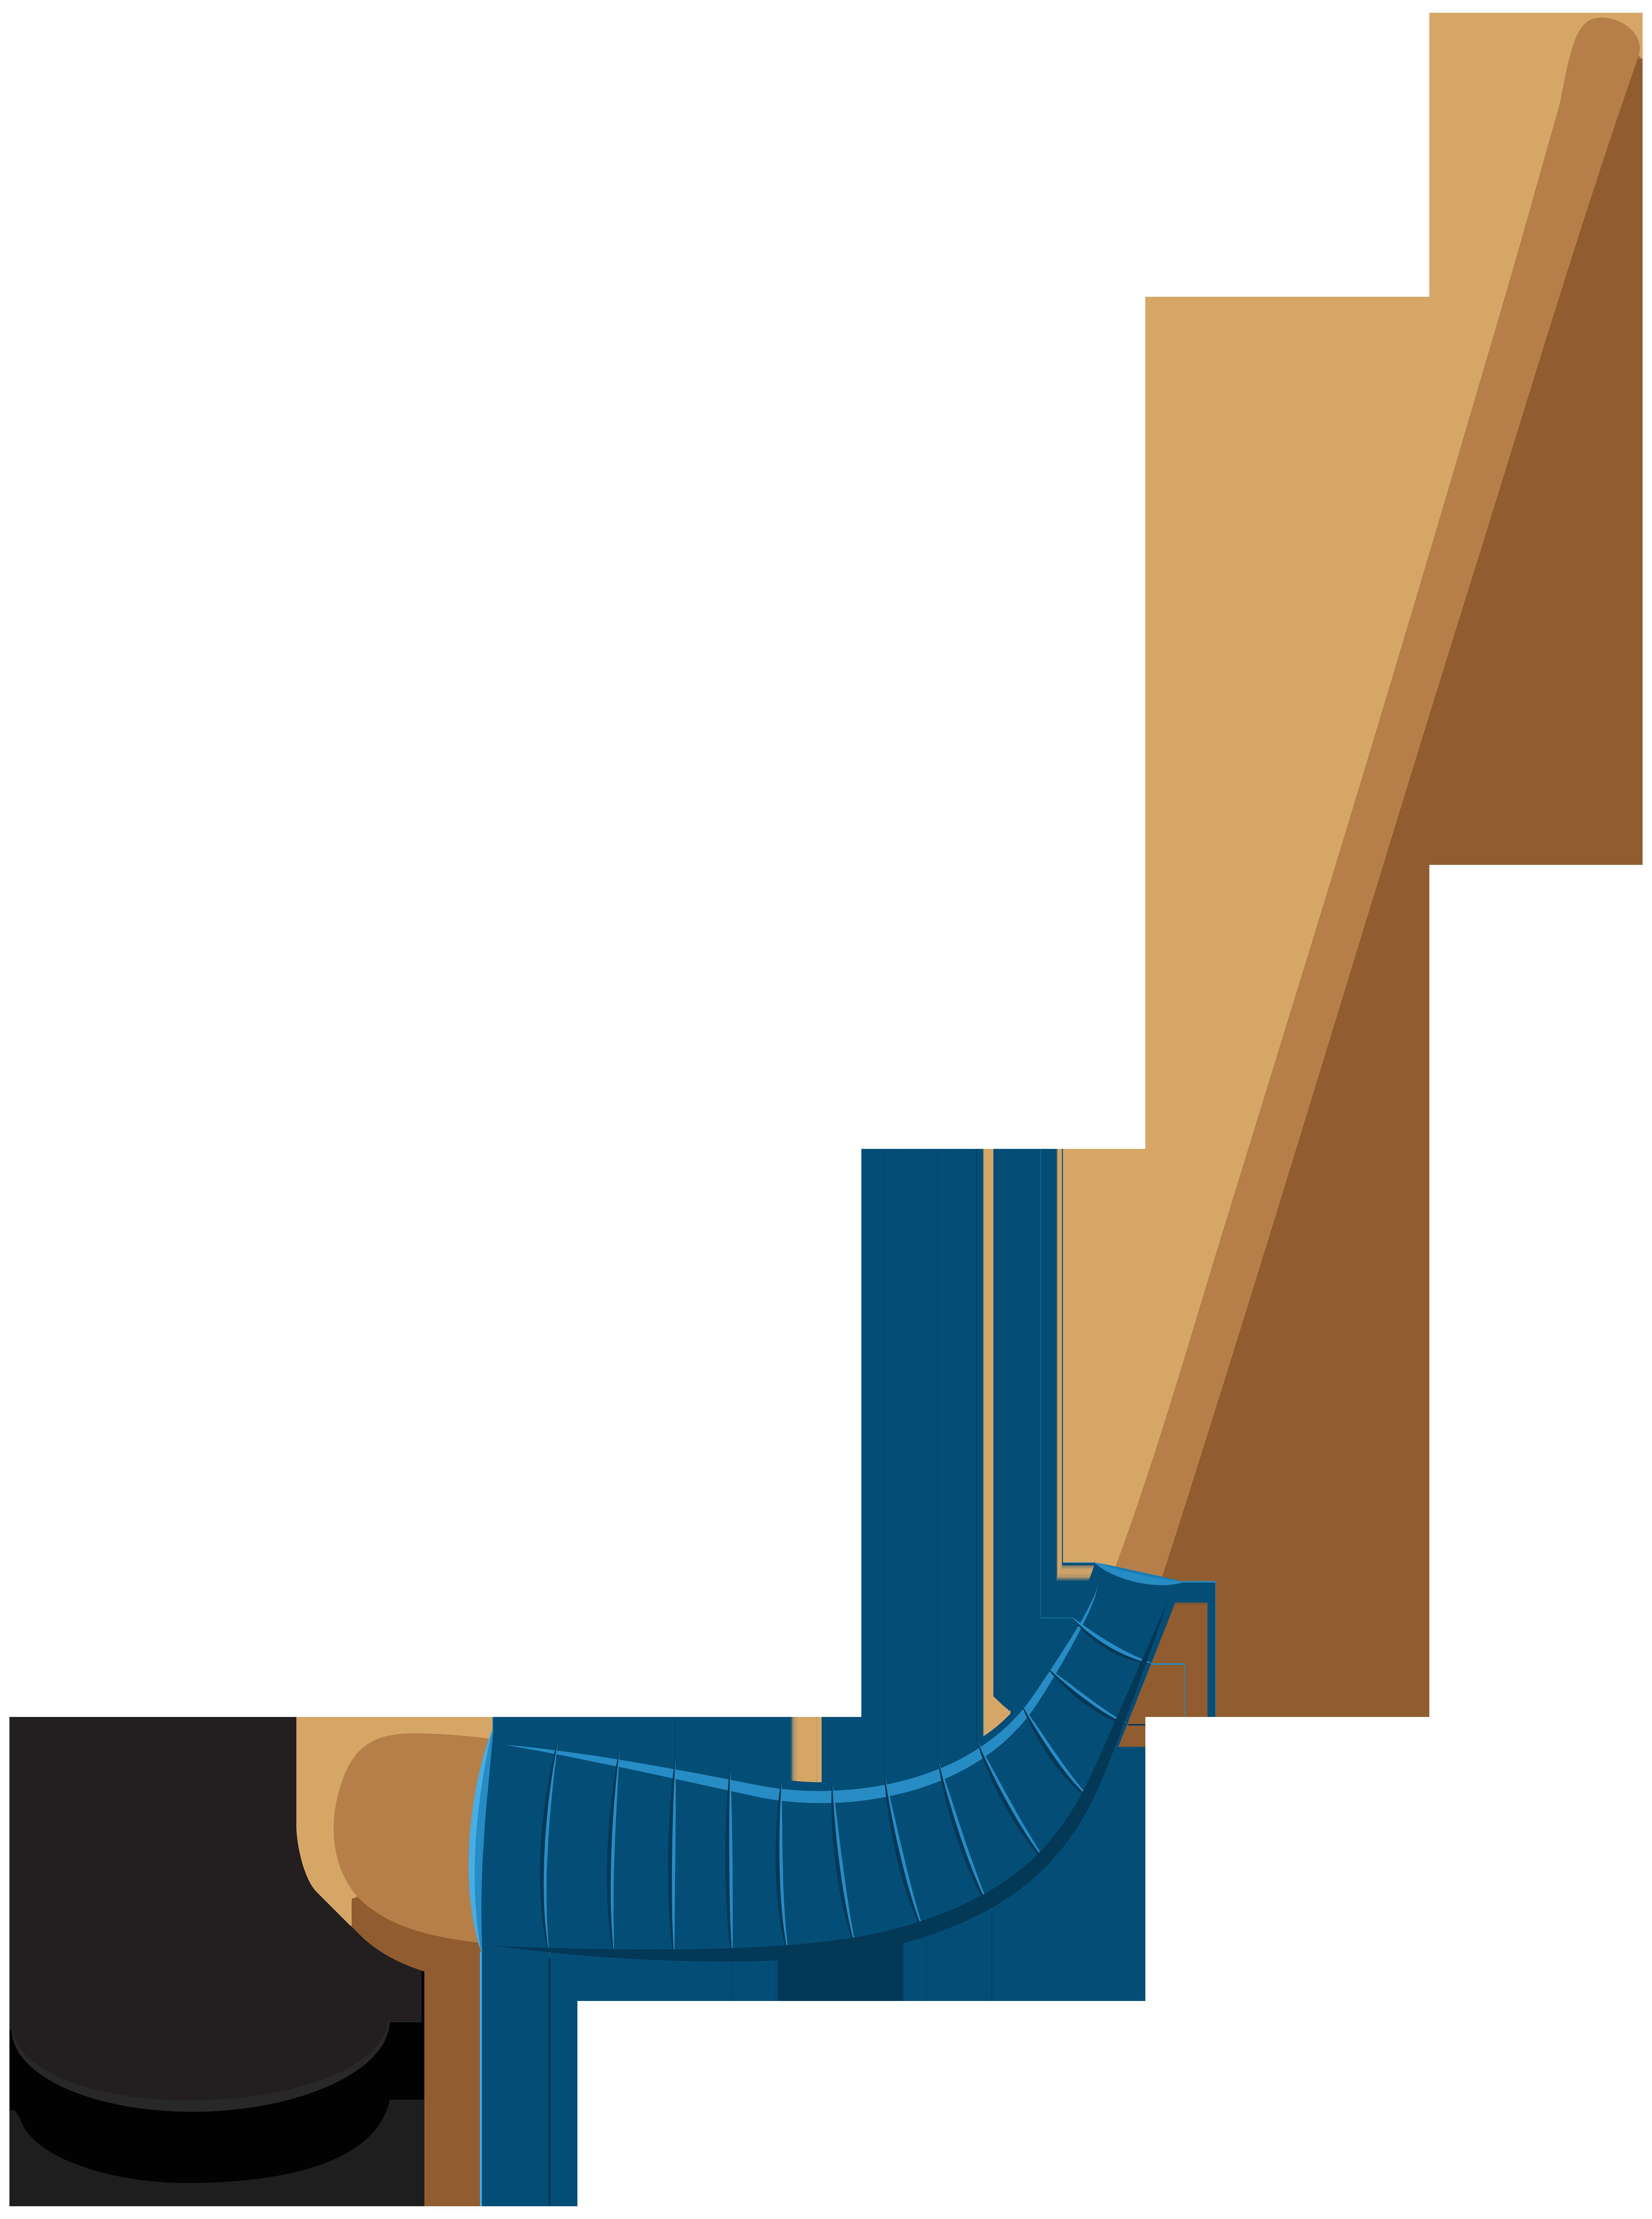 graphic free download Hockey stick cilpart. Sticks clipart